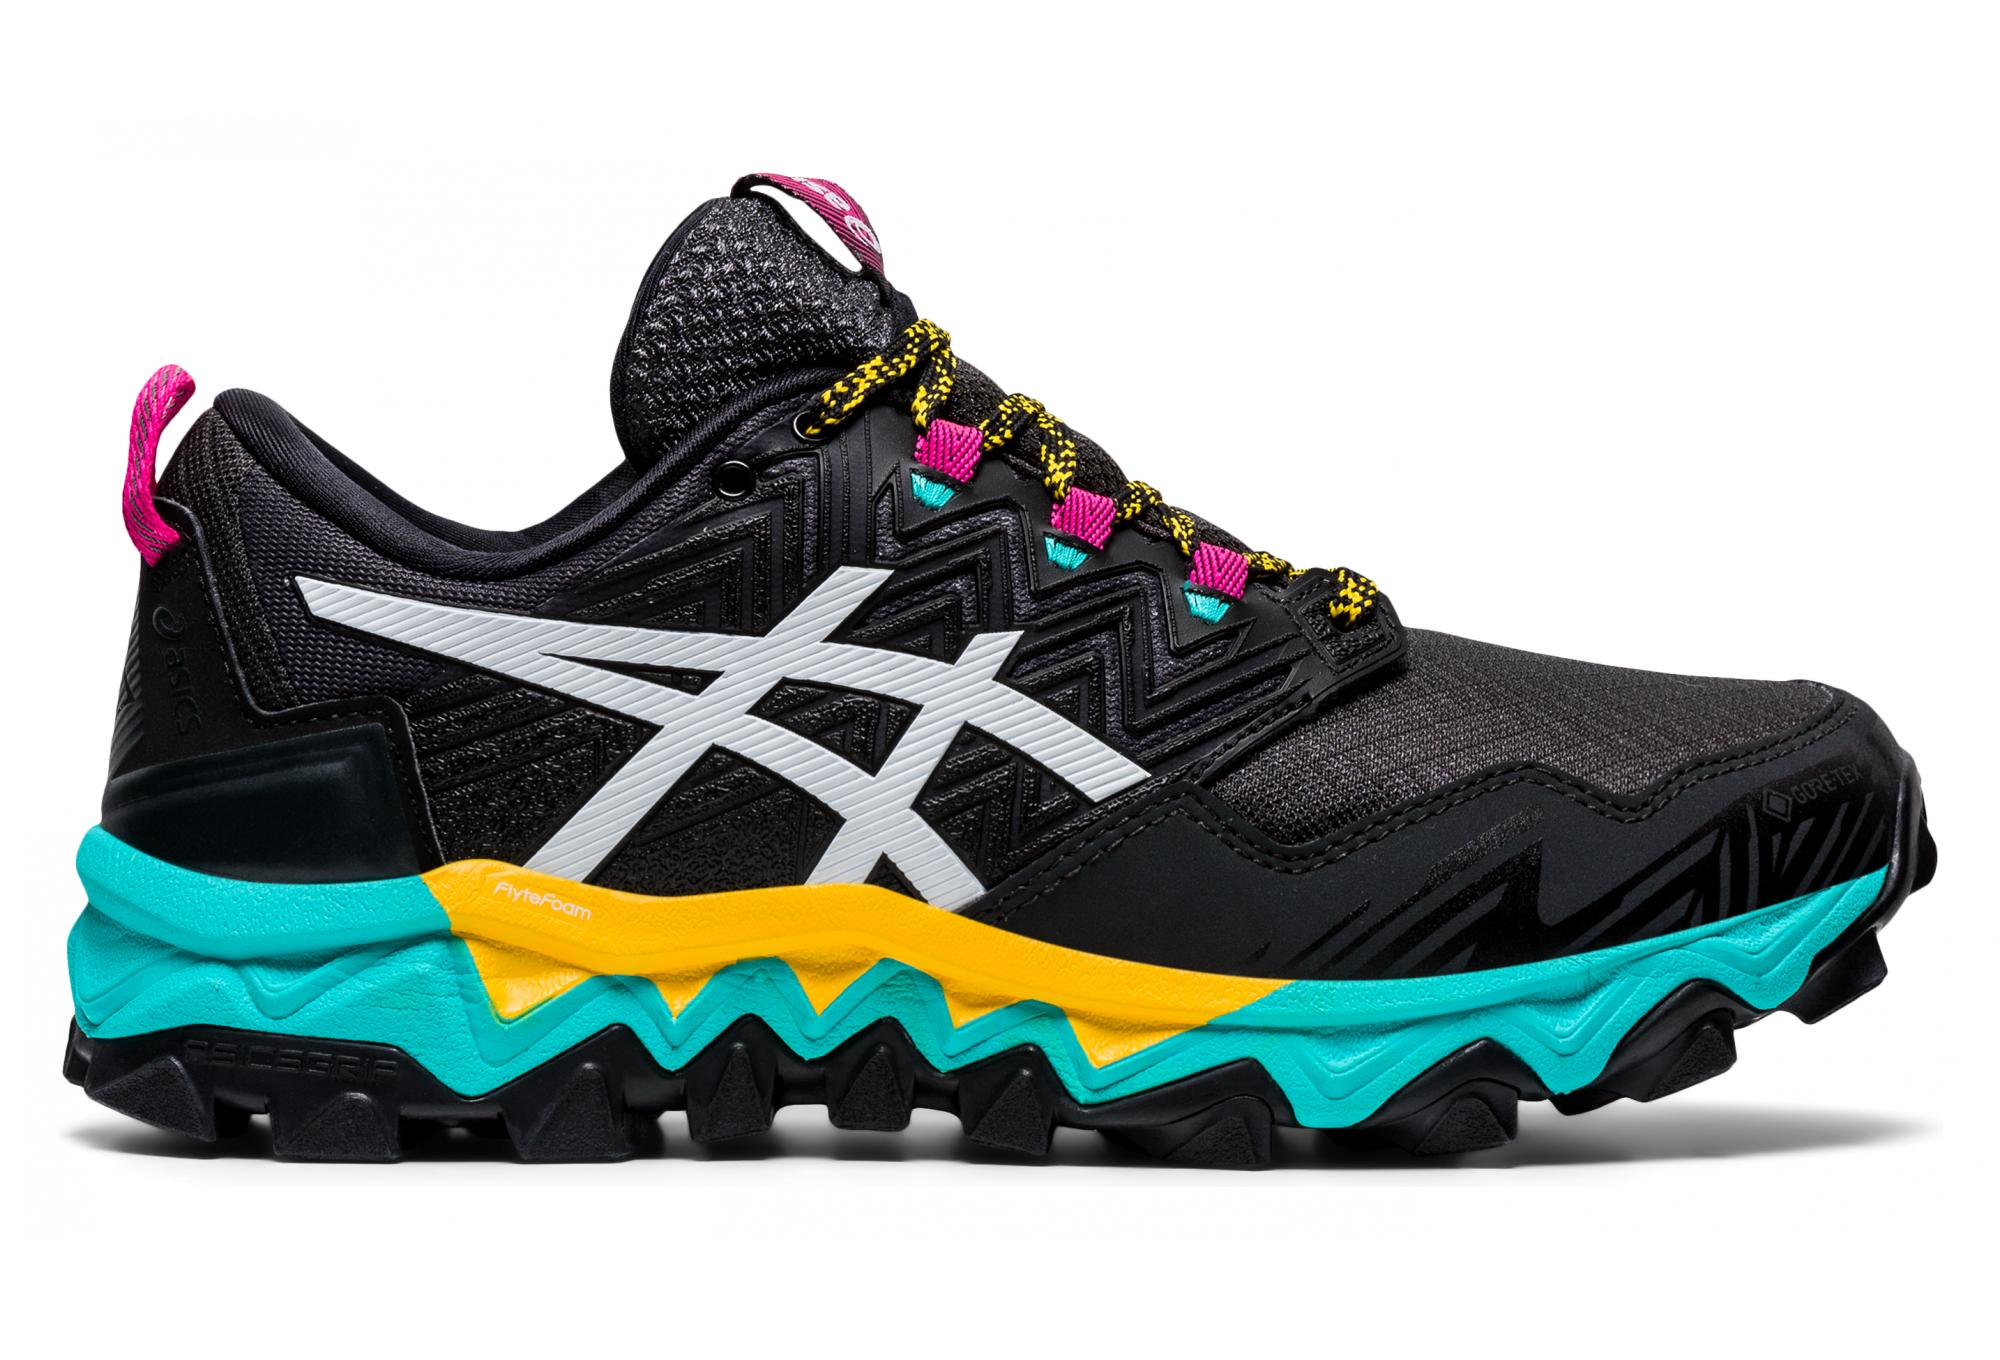 Chaussures de Trail Femme Asics Gel FujiTrabuco 8 GTX Noir / Vert ...